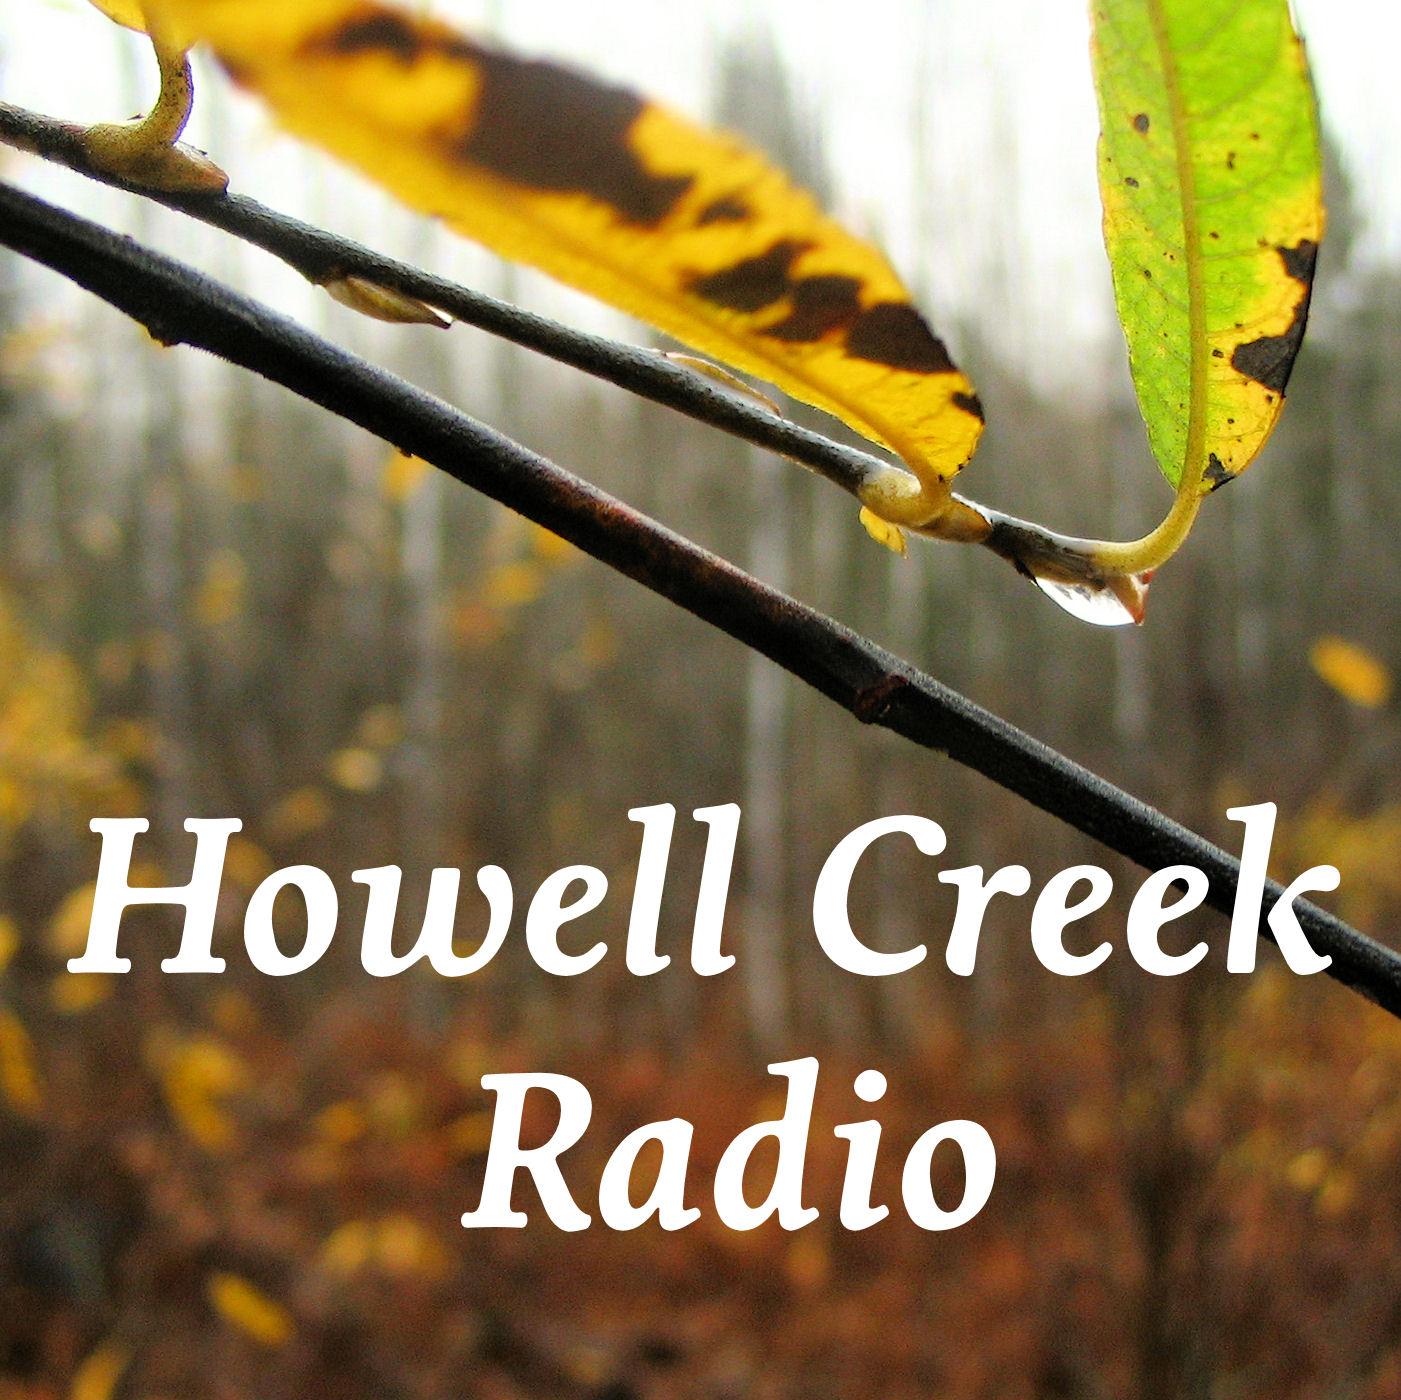 Howell Creek Radio